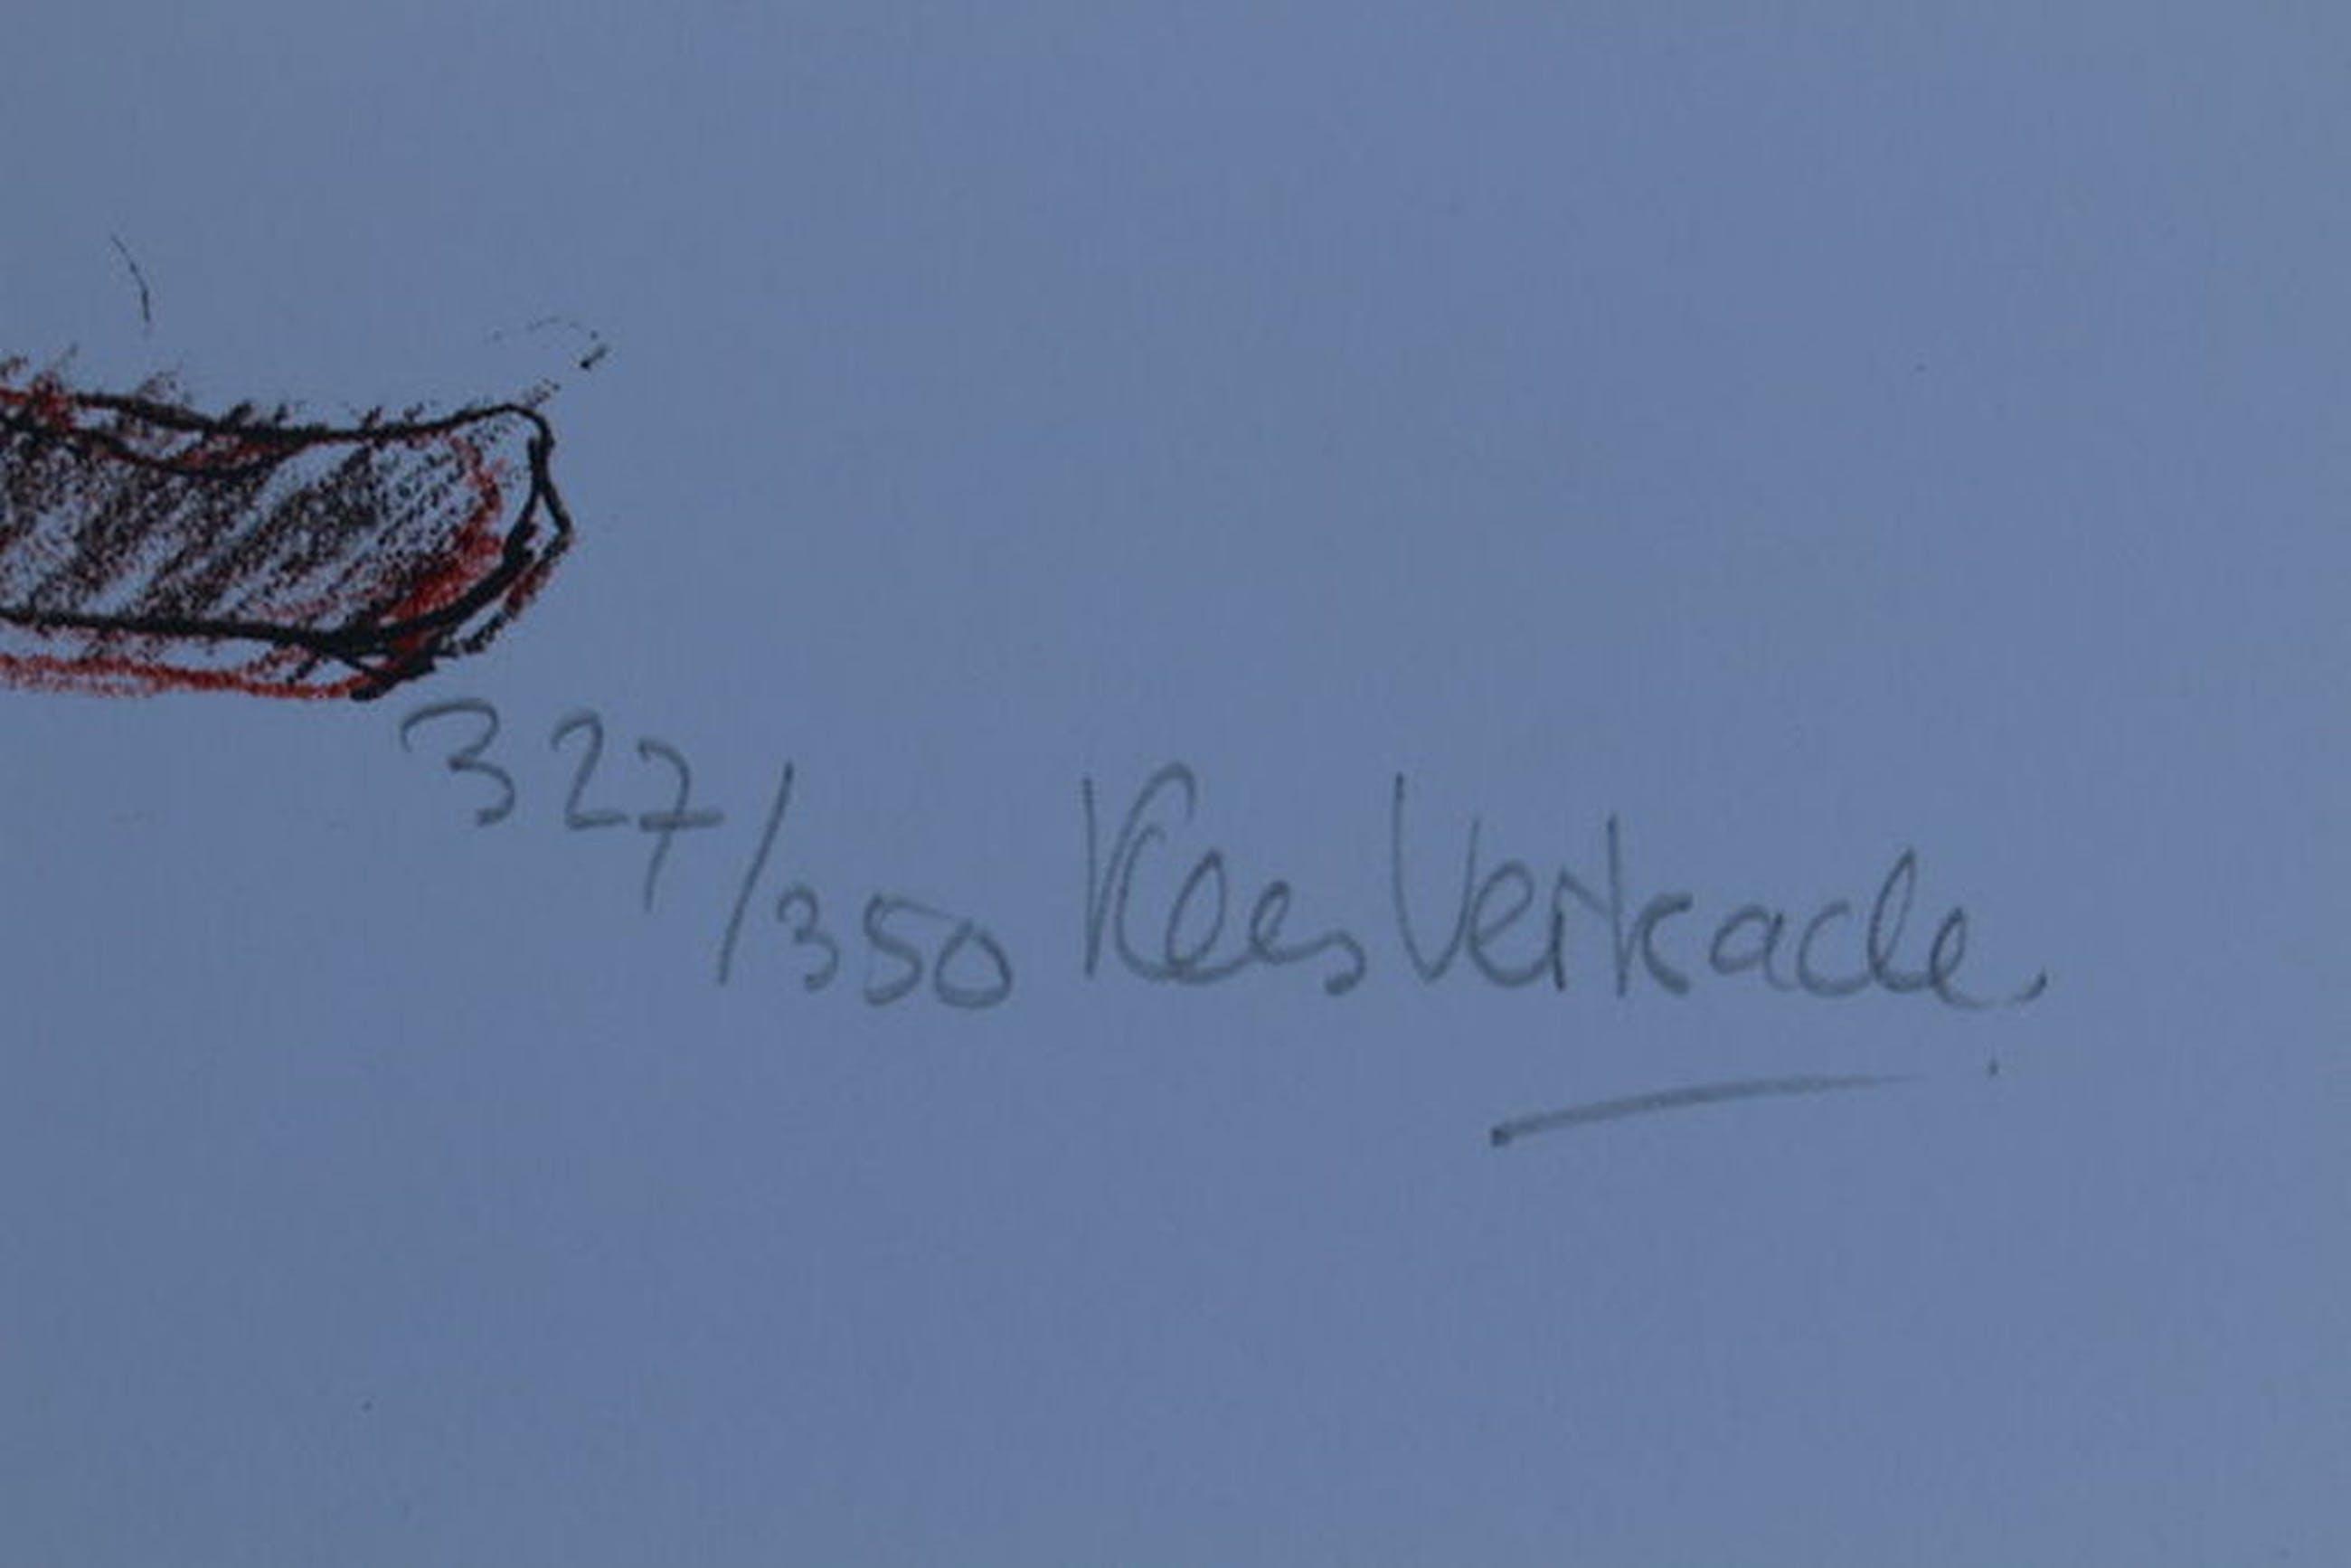 Kees Verkade  (1941) - handgesigneerde kleurenlitho met potlood -  oplage 350 kopen? Bied vanaf 50!